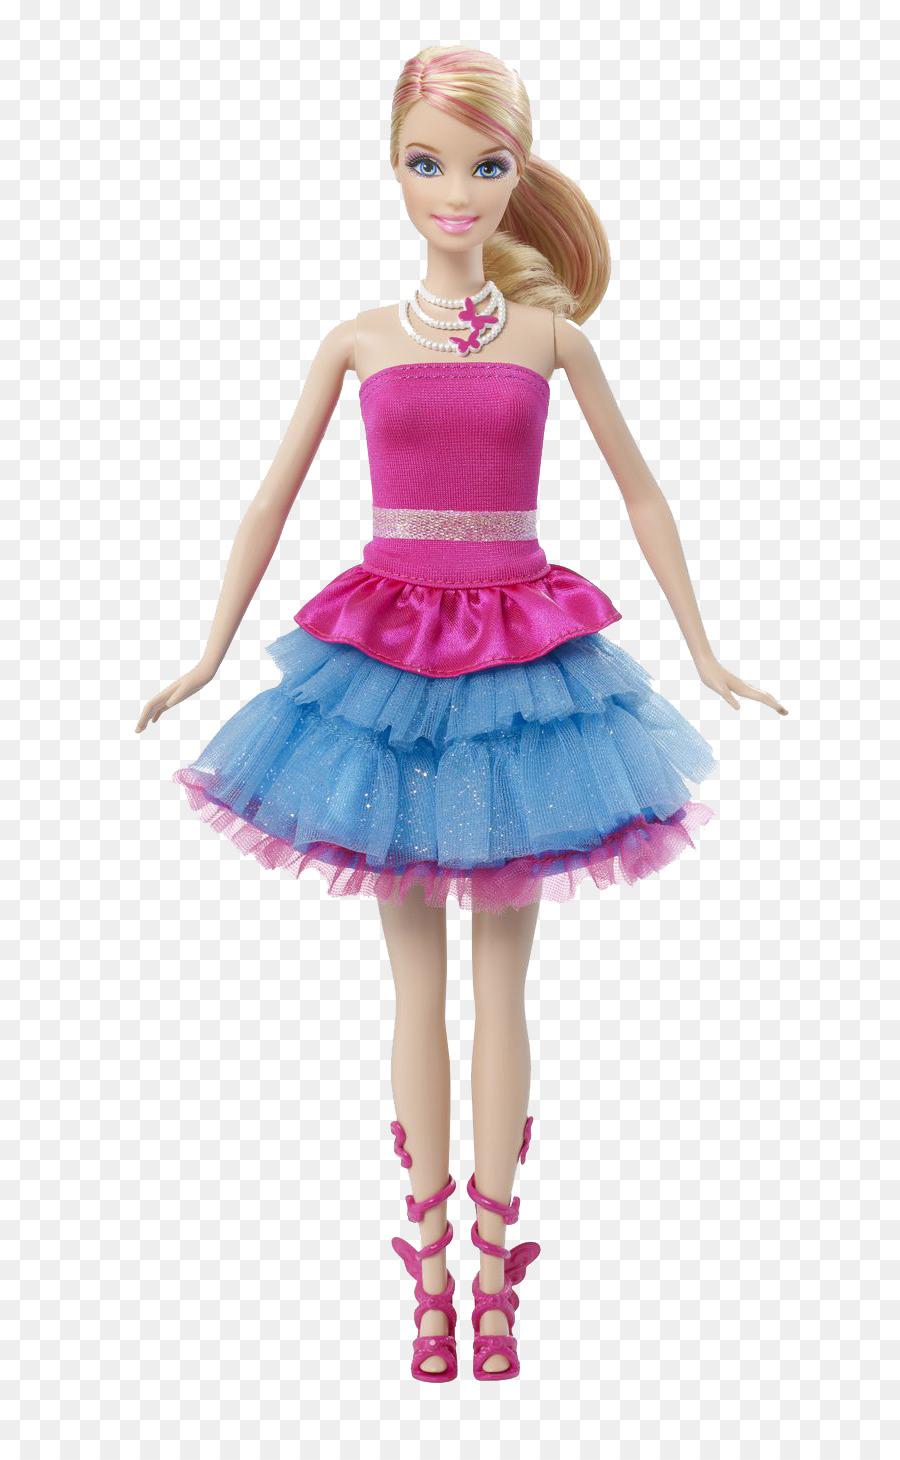 Barbie: A Fairy Secret Ken Raquelle Muñeca - Muñeca Barbie PNG ...